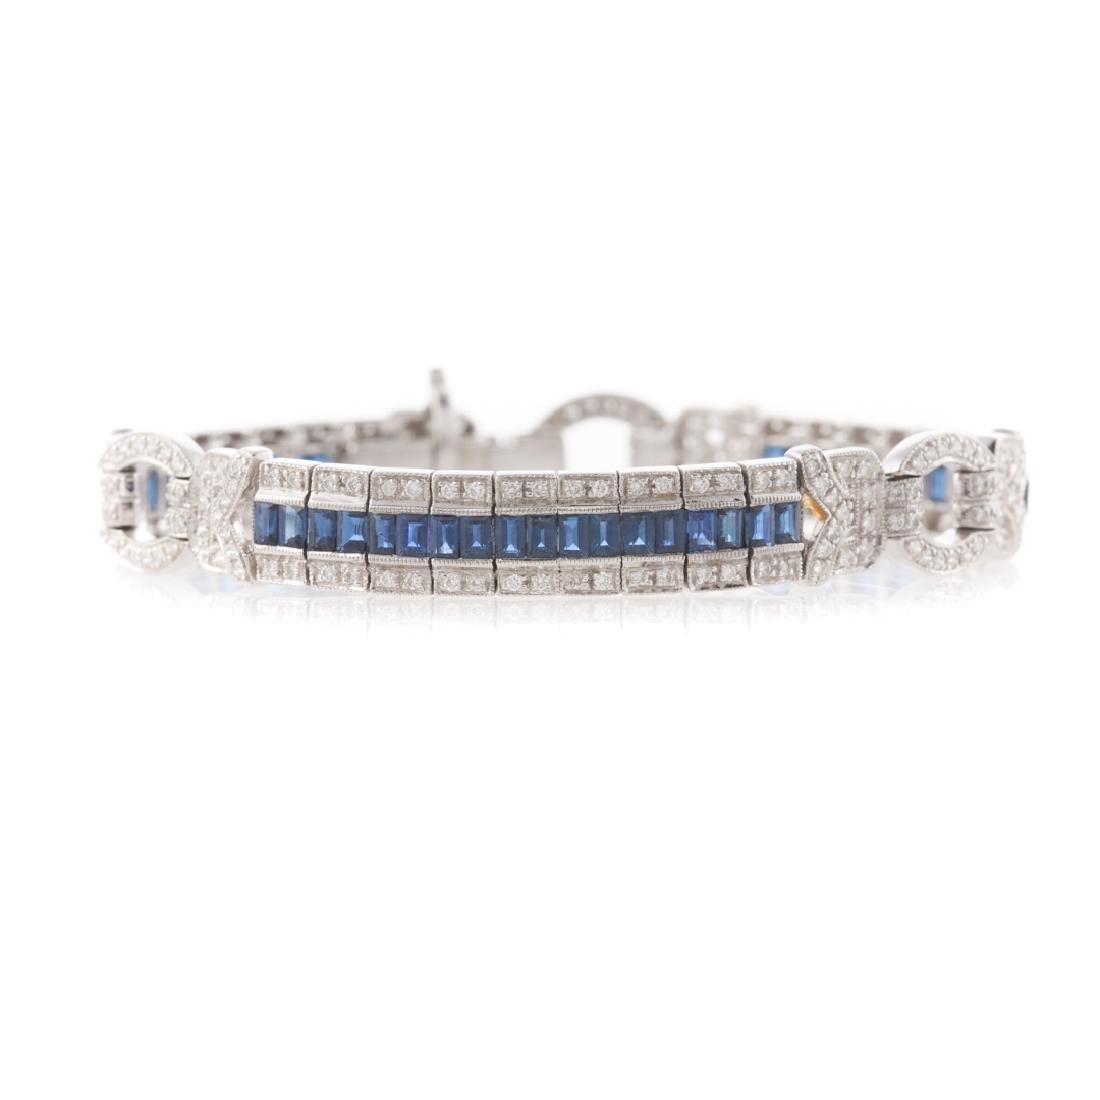 A 18K White Gold Diamond & Sapphire Bracelet